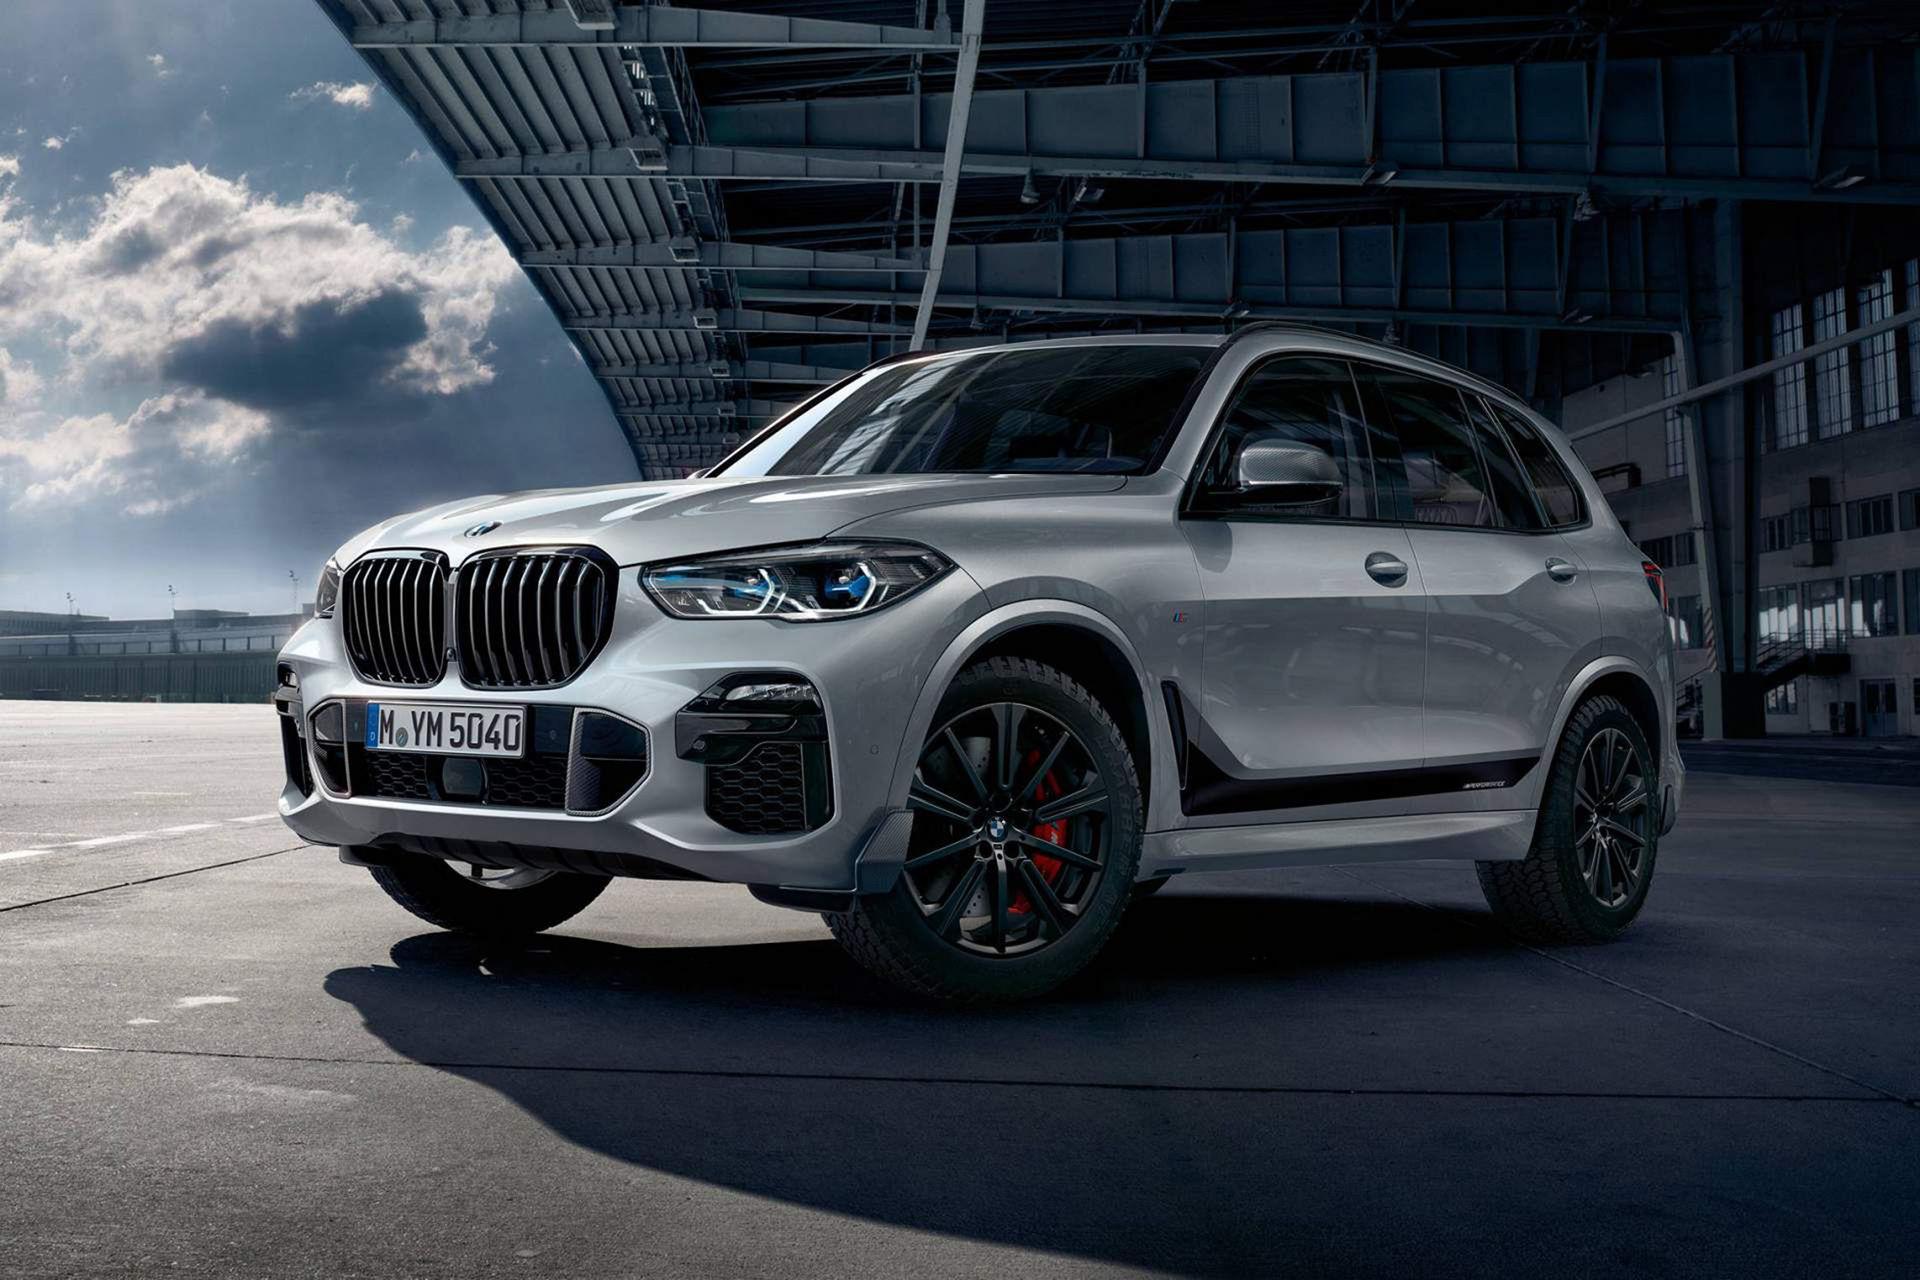 Nya BMW X5 med M Performance-delar